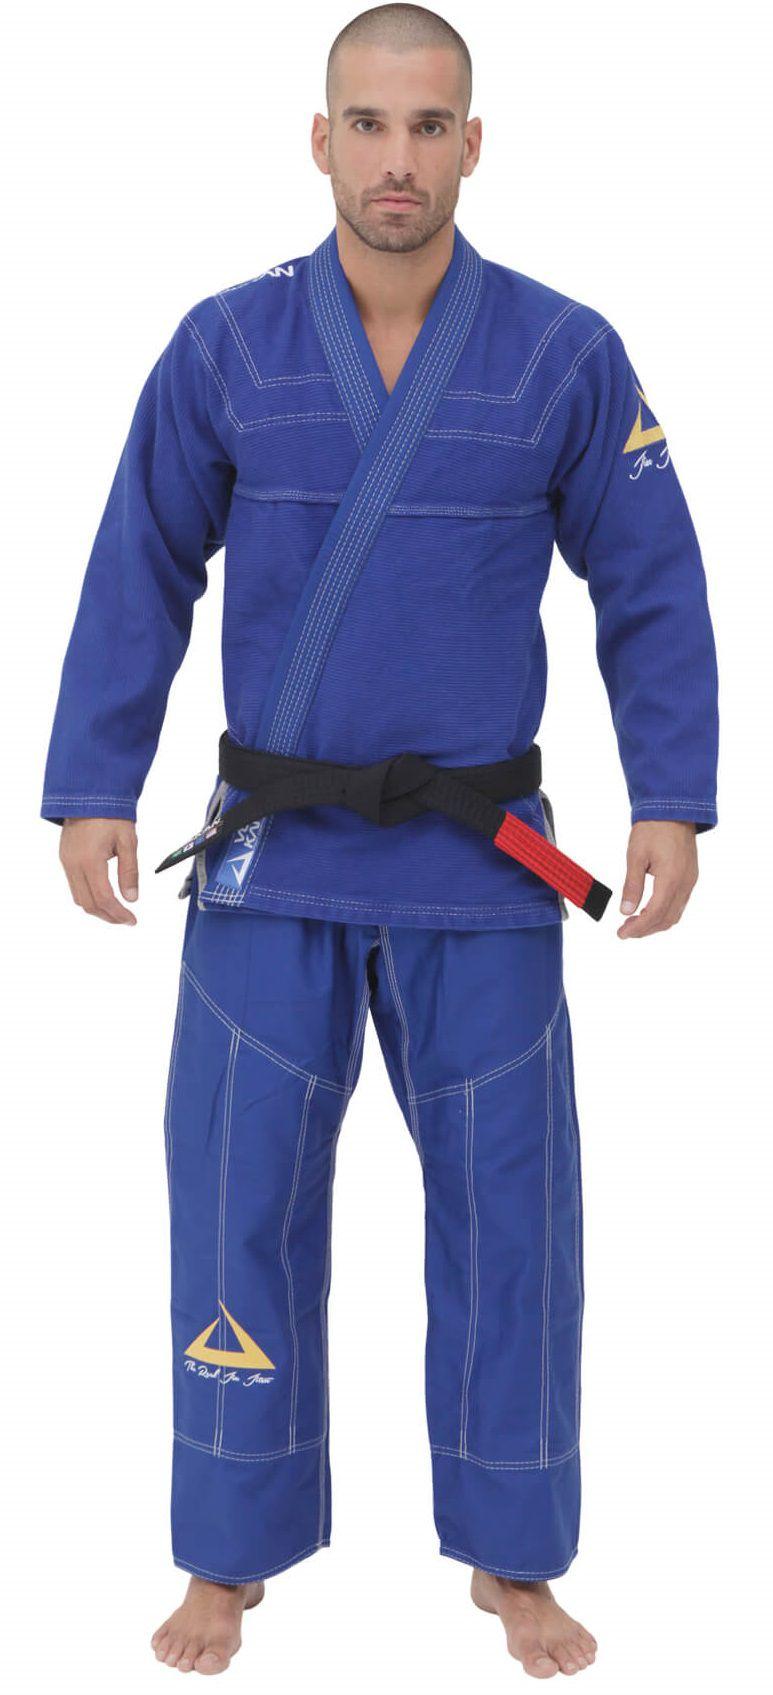 Kimono Vulkan Para Jiu-jitsu Profissional Adulto - SKY PRO AZUL ROYAL 87e9a3c3035cd